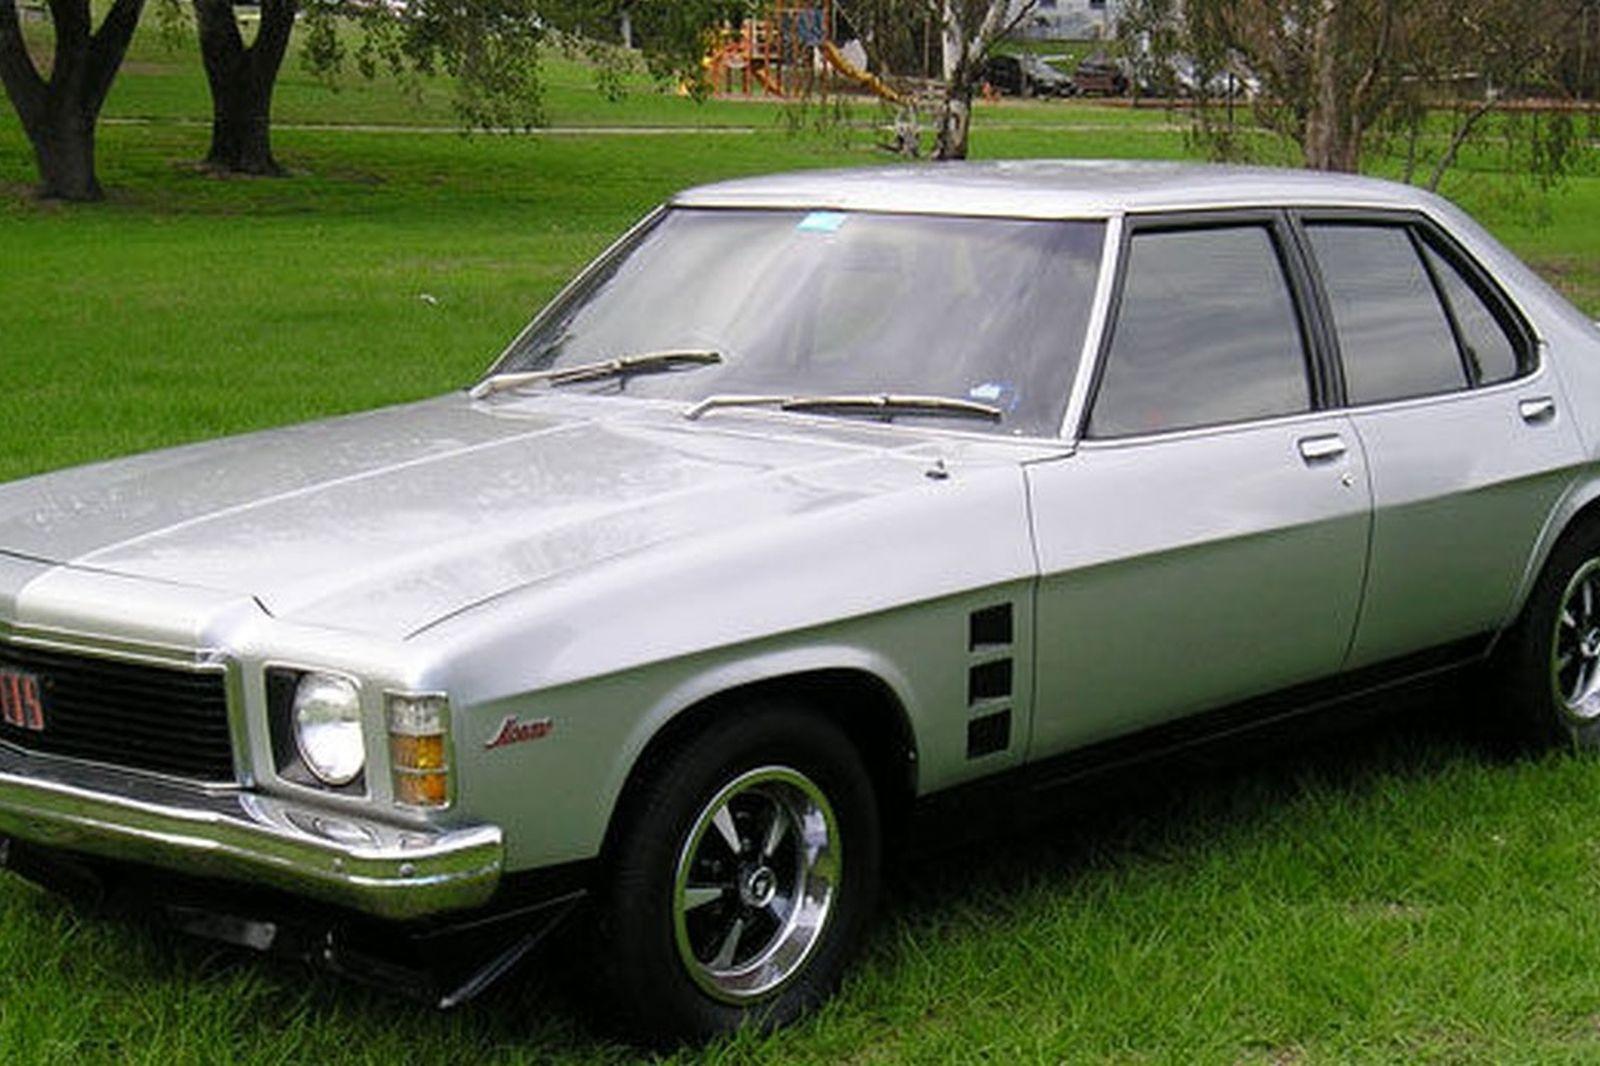 Sold Holden Hj Monaro Gts Sedan Auctions Lot 5 Shannons